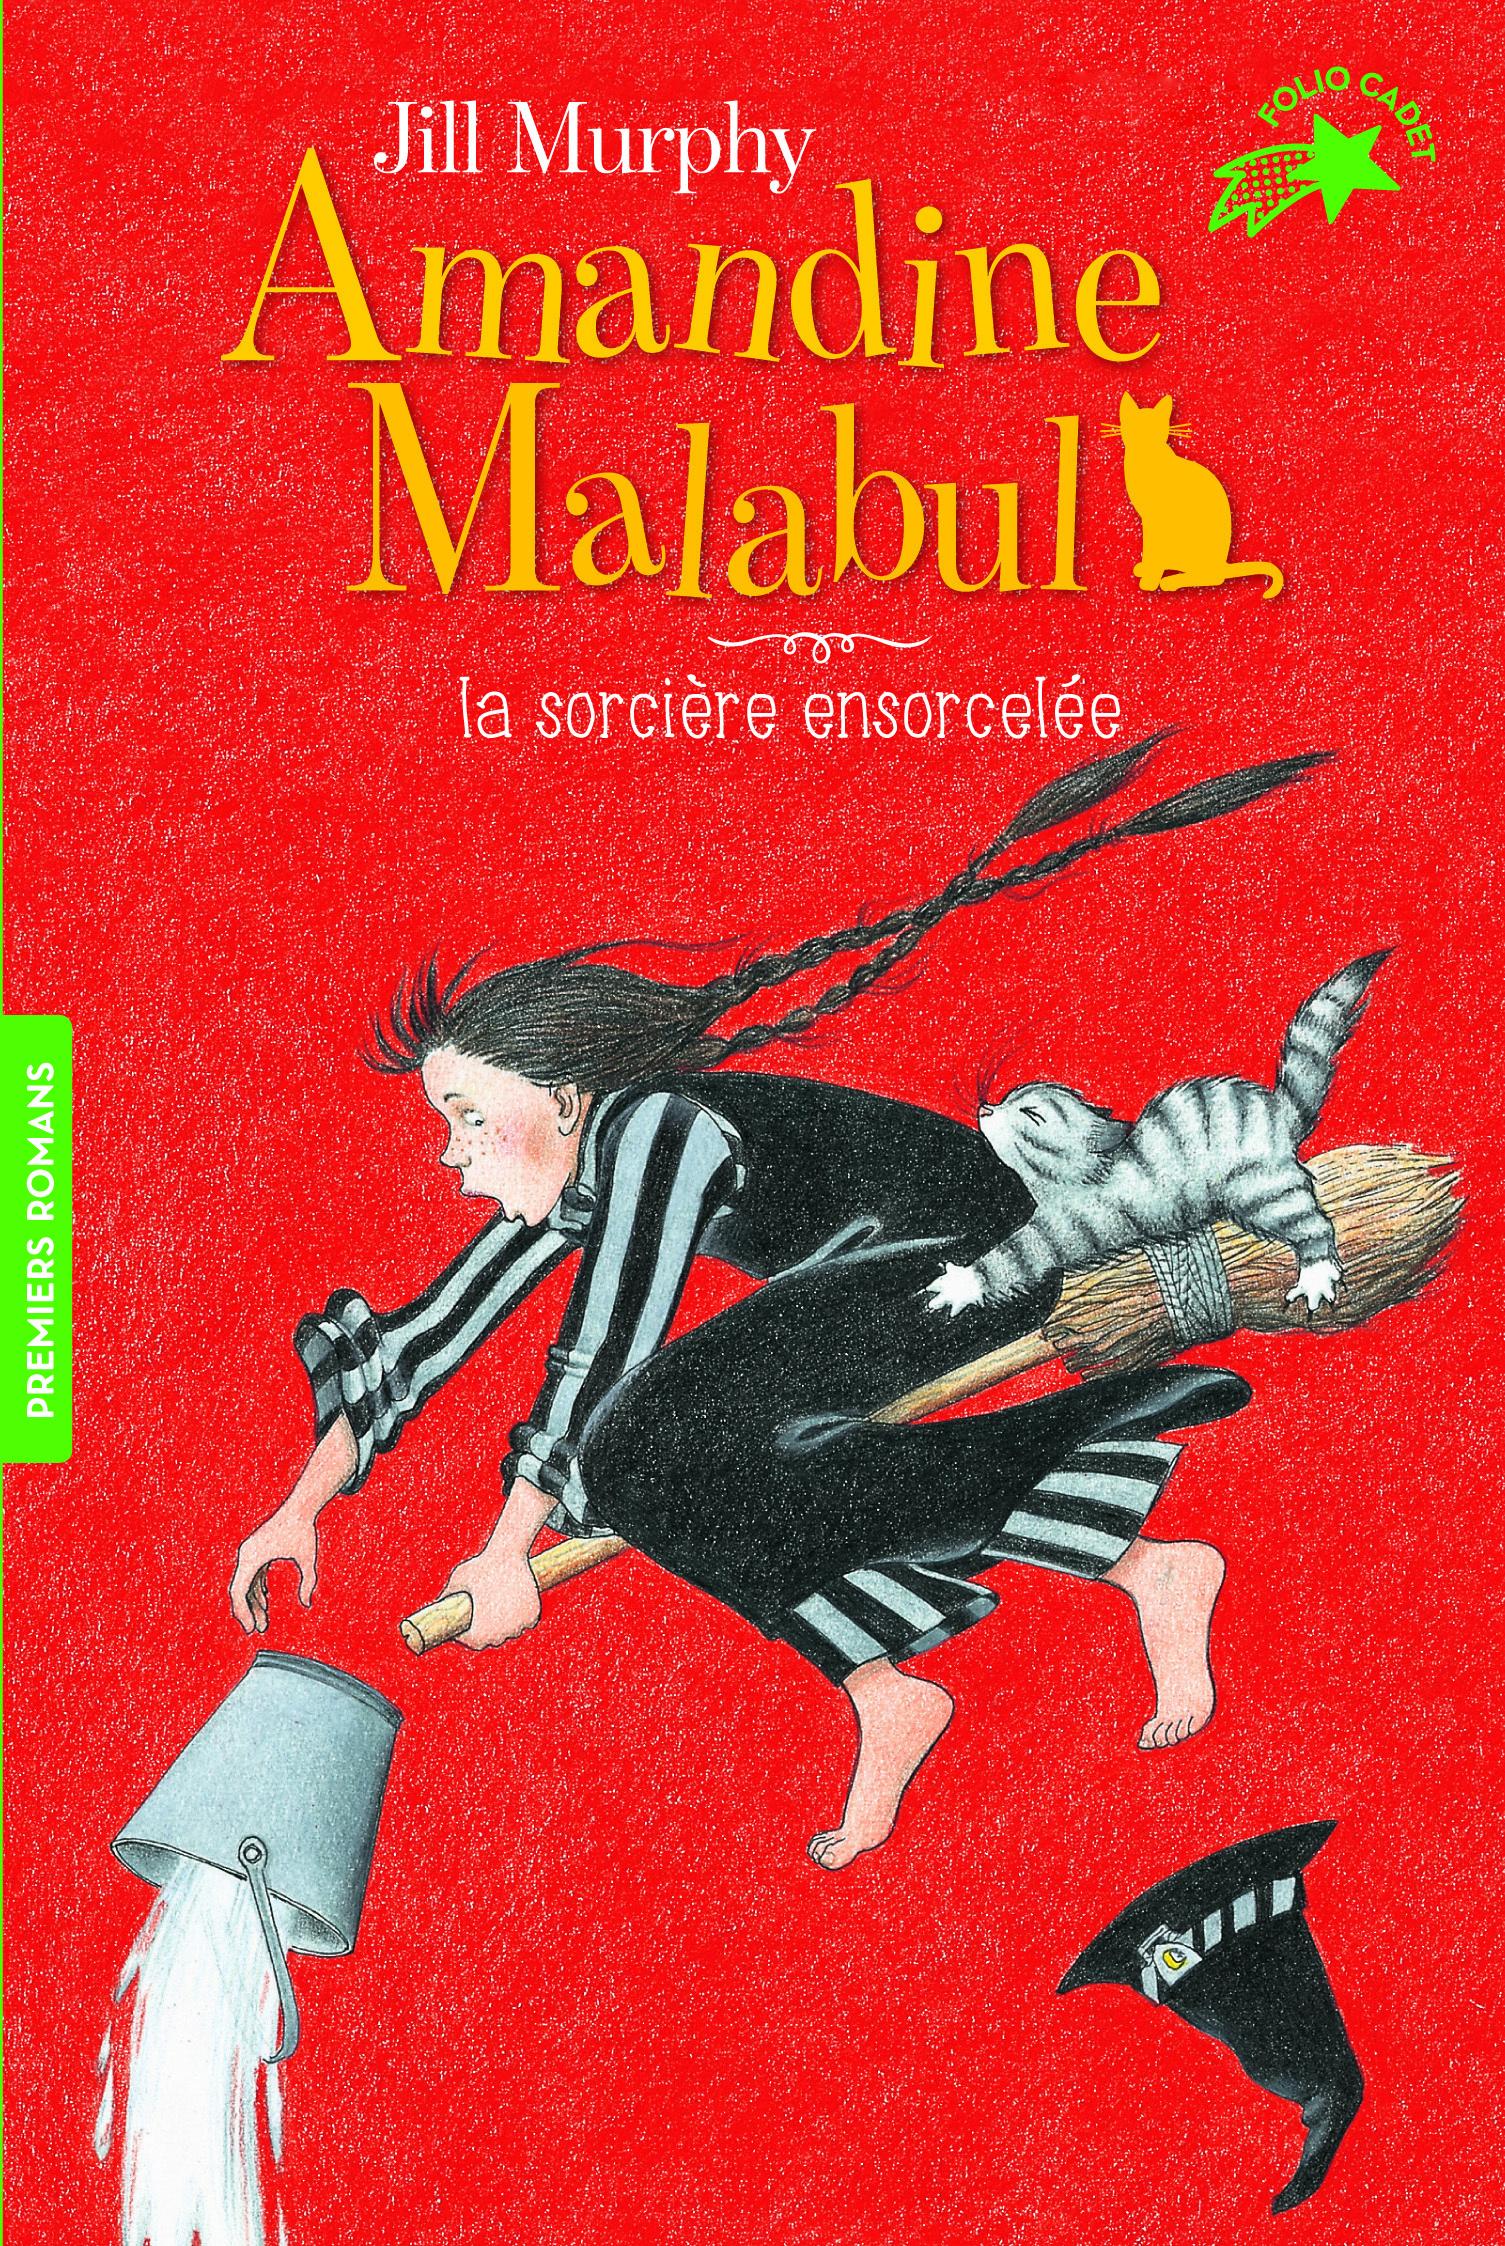 AMANDINE MALABUL, LA SORCIERE ENSORCELEE